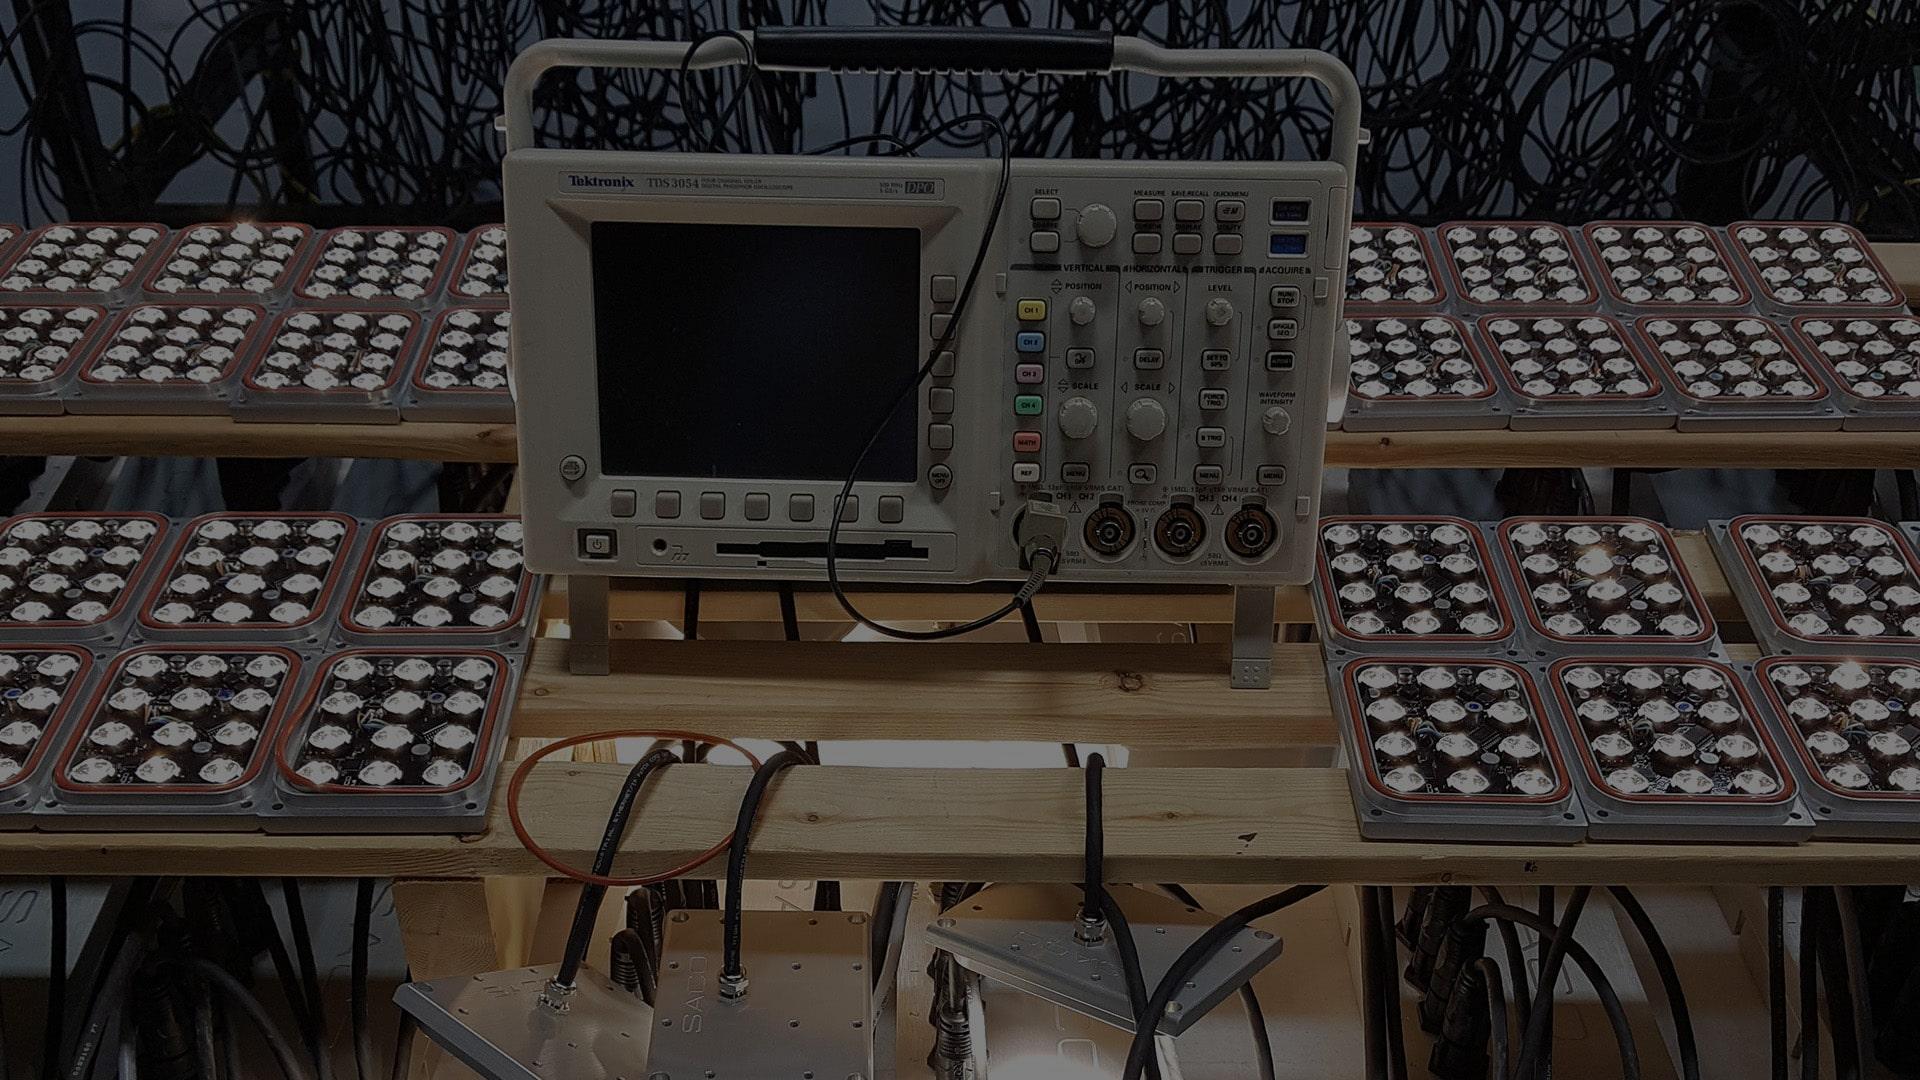 ELECTRONICS ASSEMBLER